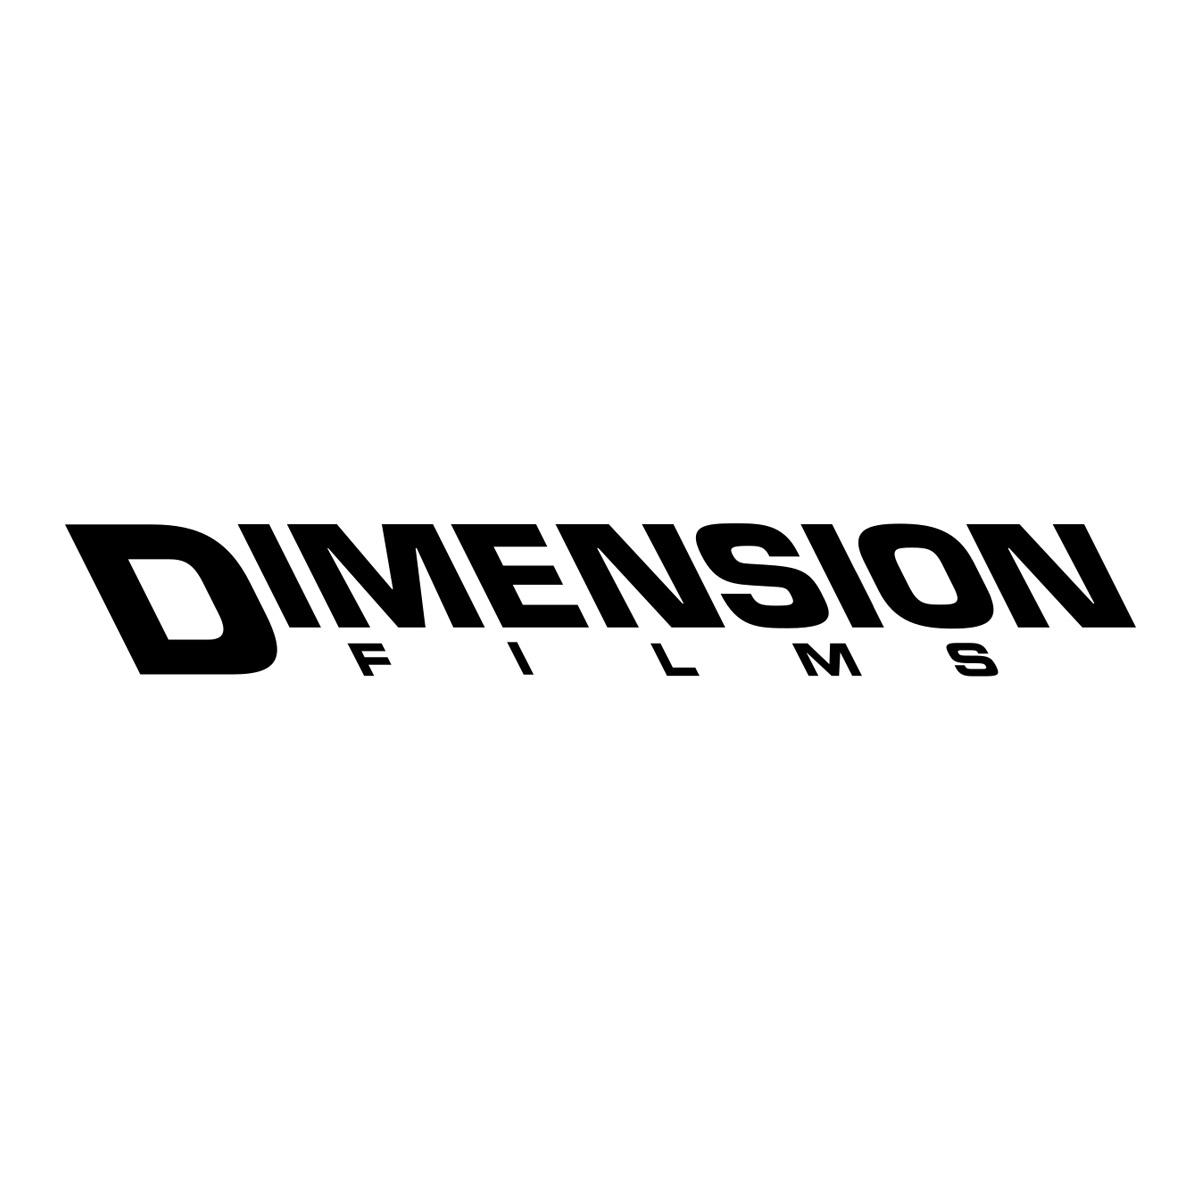 Dimension_Films_logo.jpg